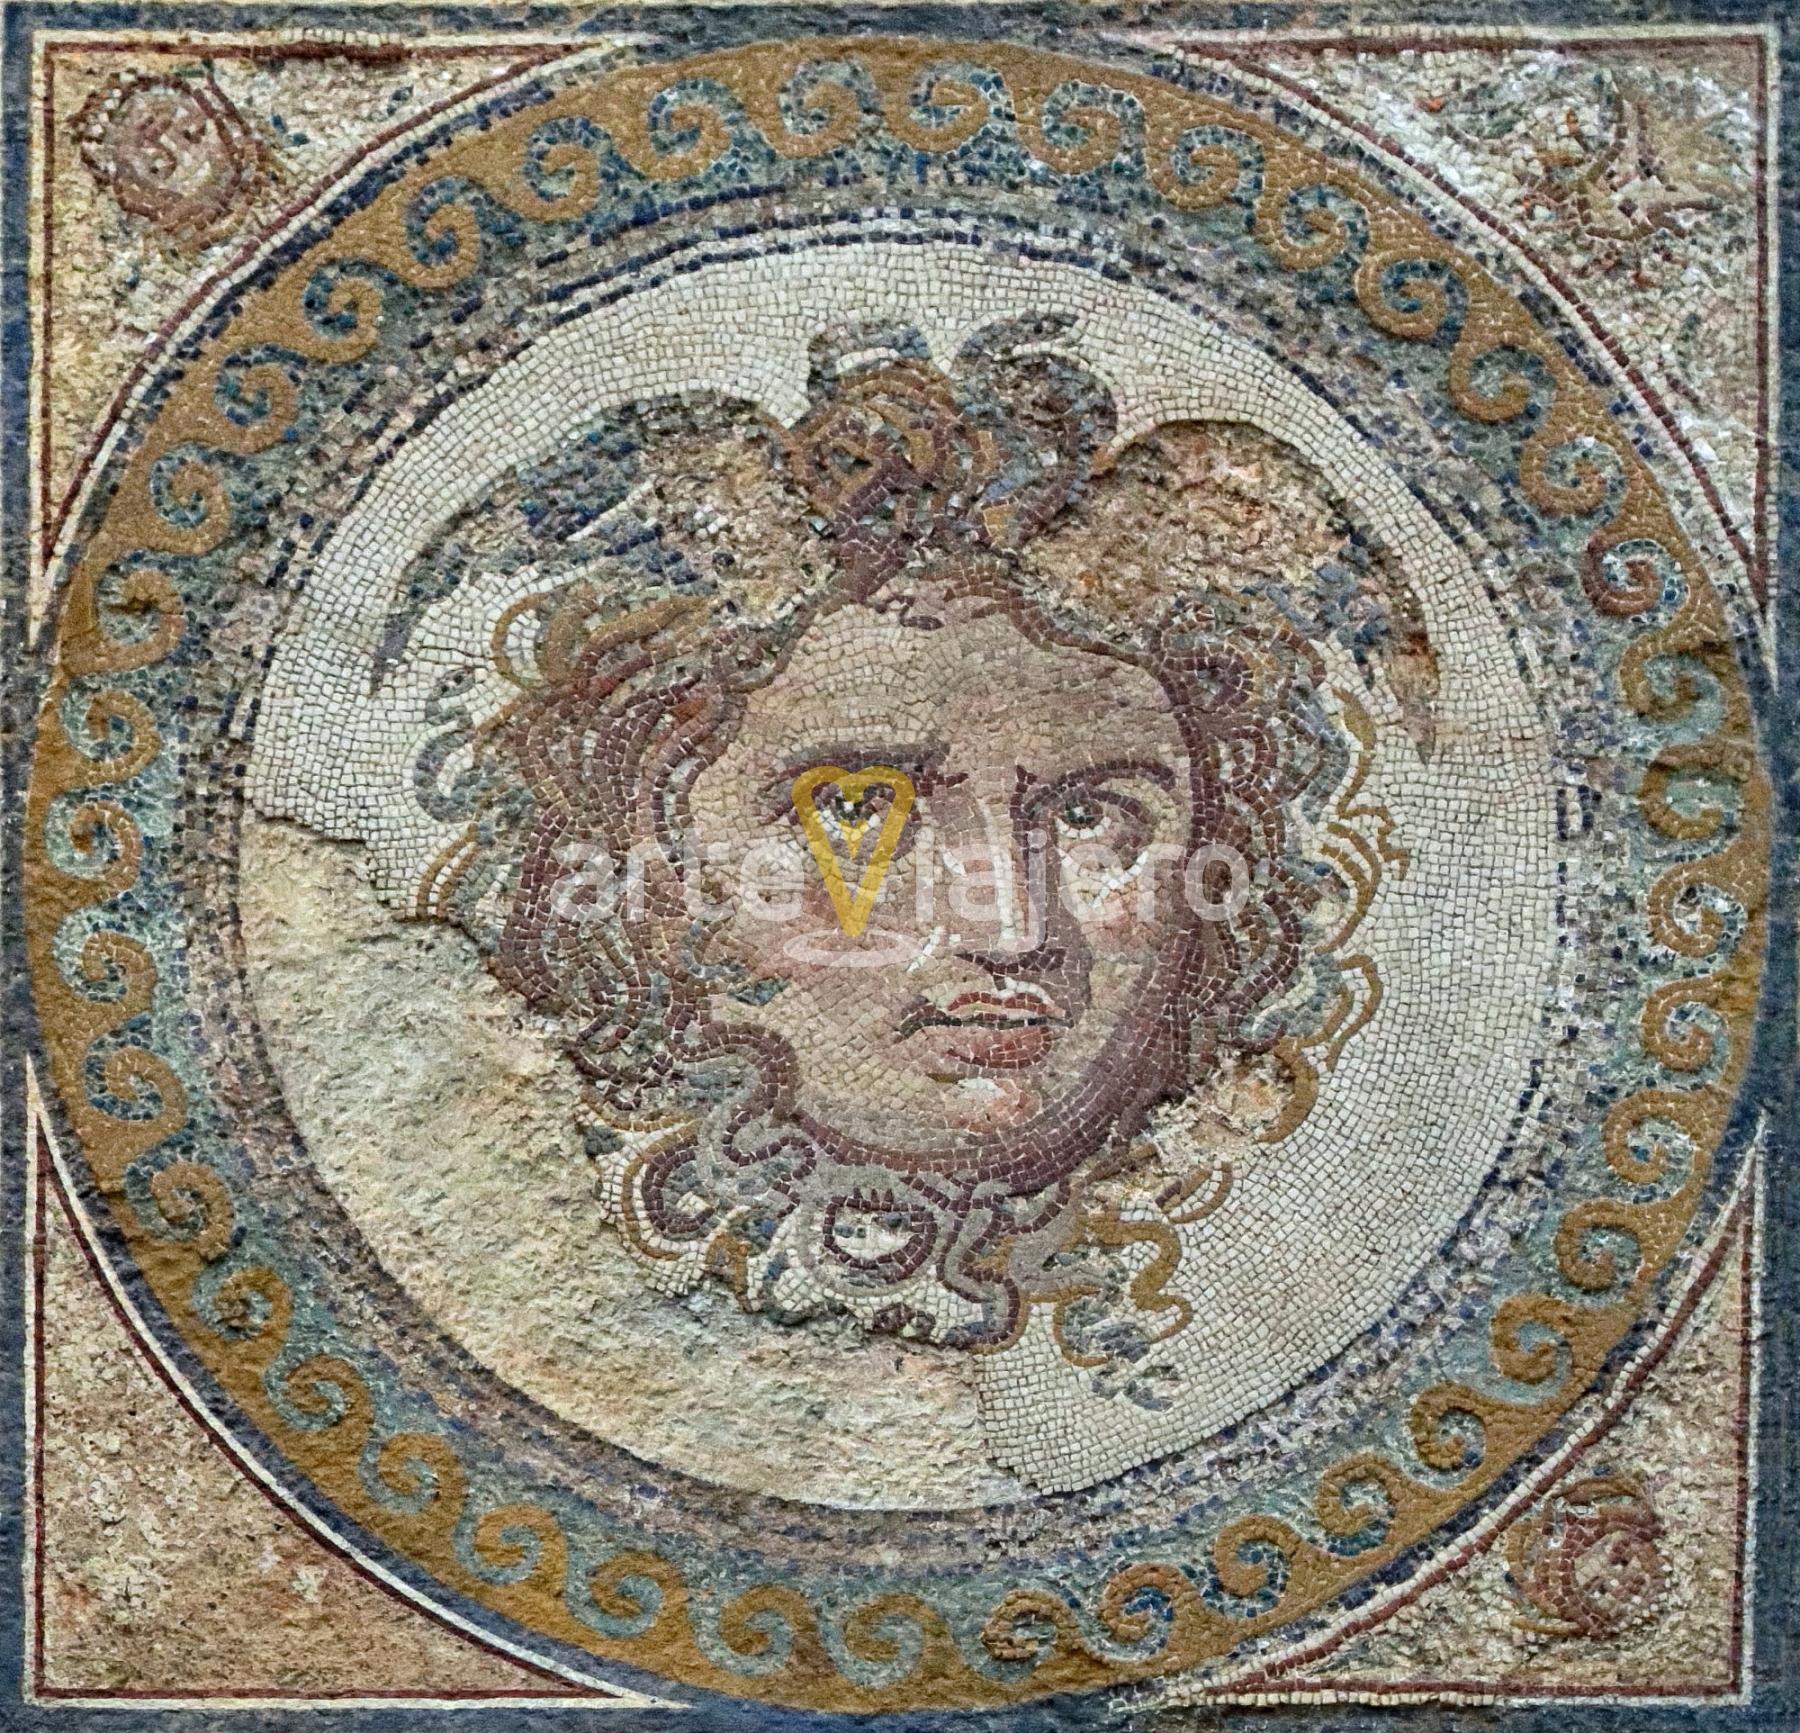 mosaico de medusa, tarragona